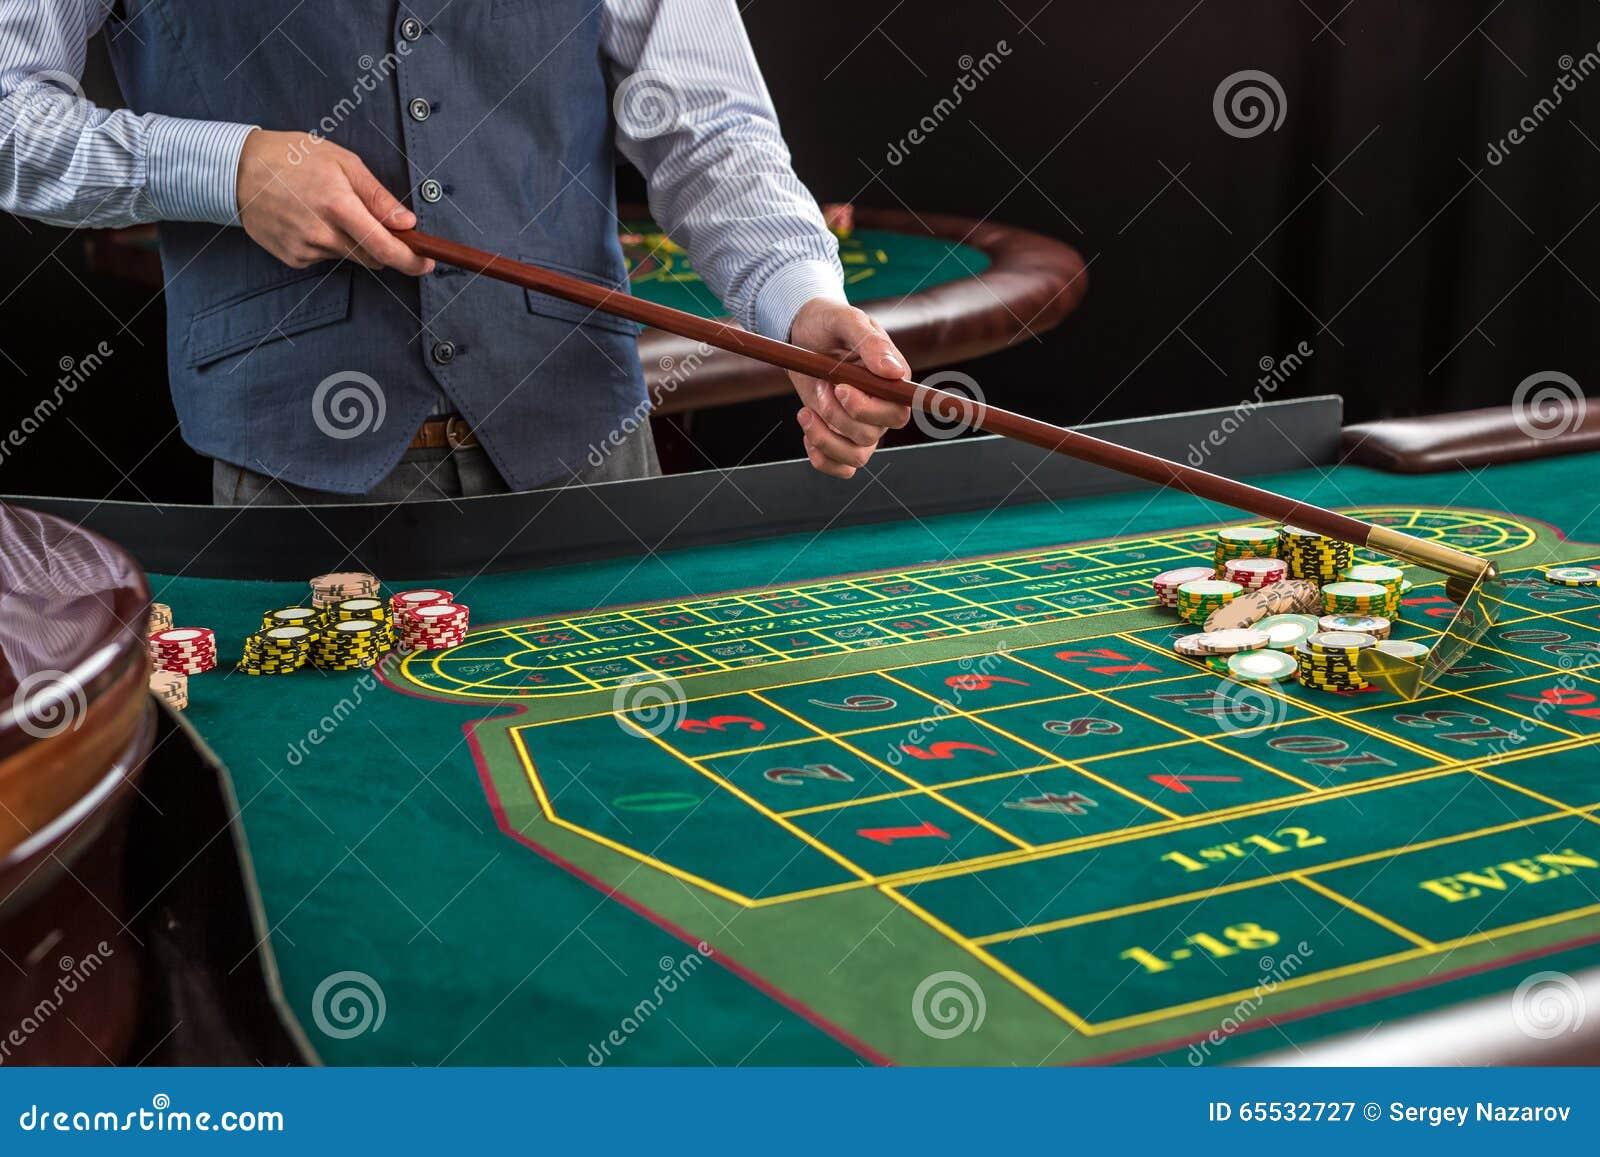 Stick gambling intel aufbaukurs online